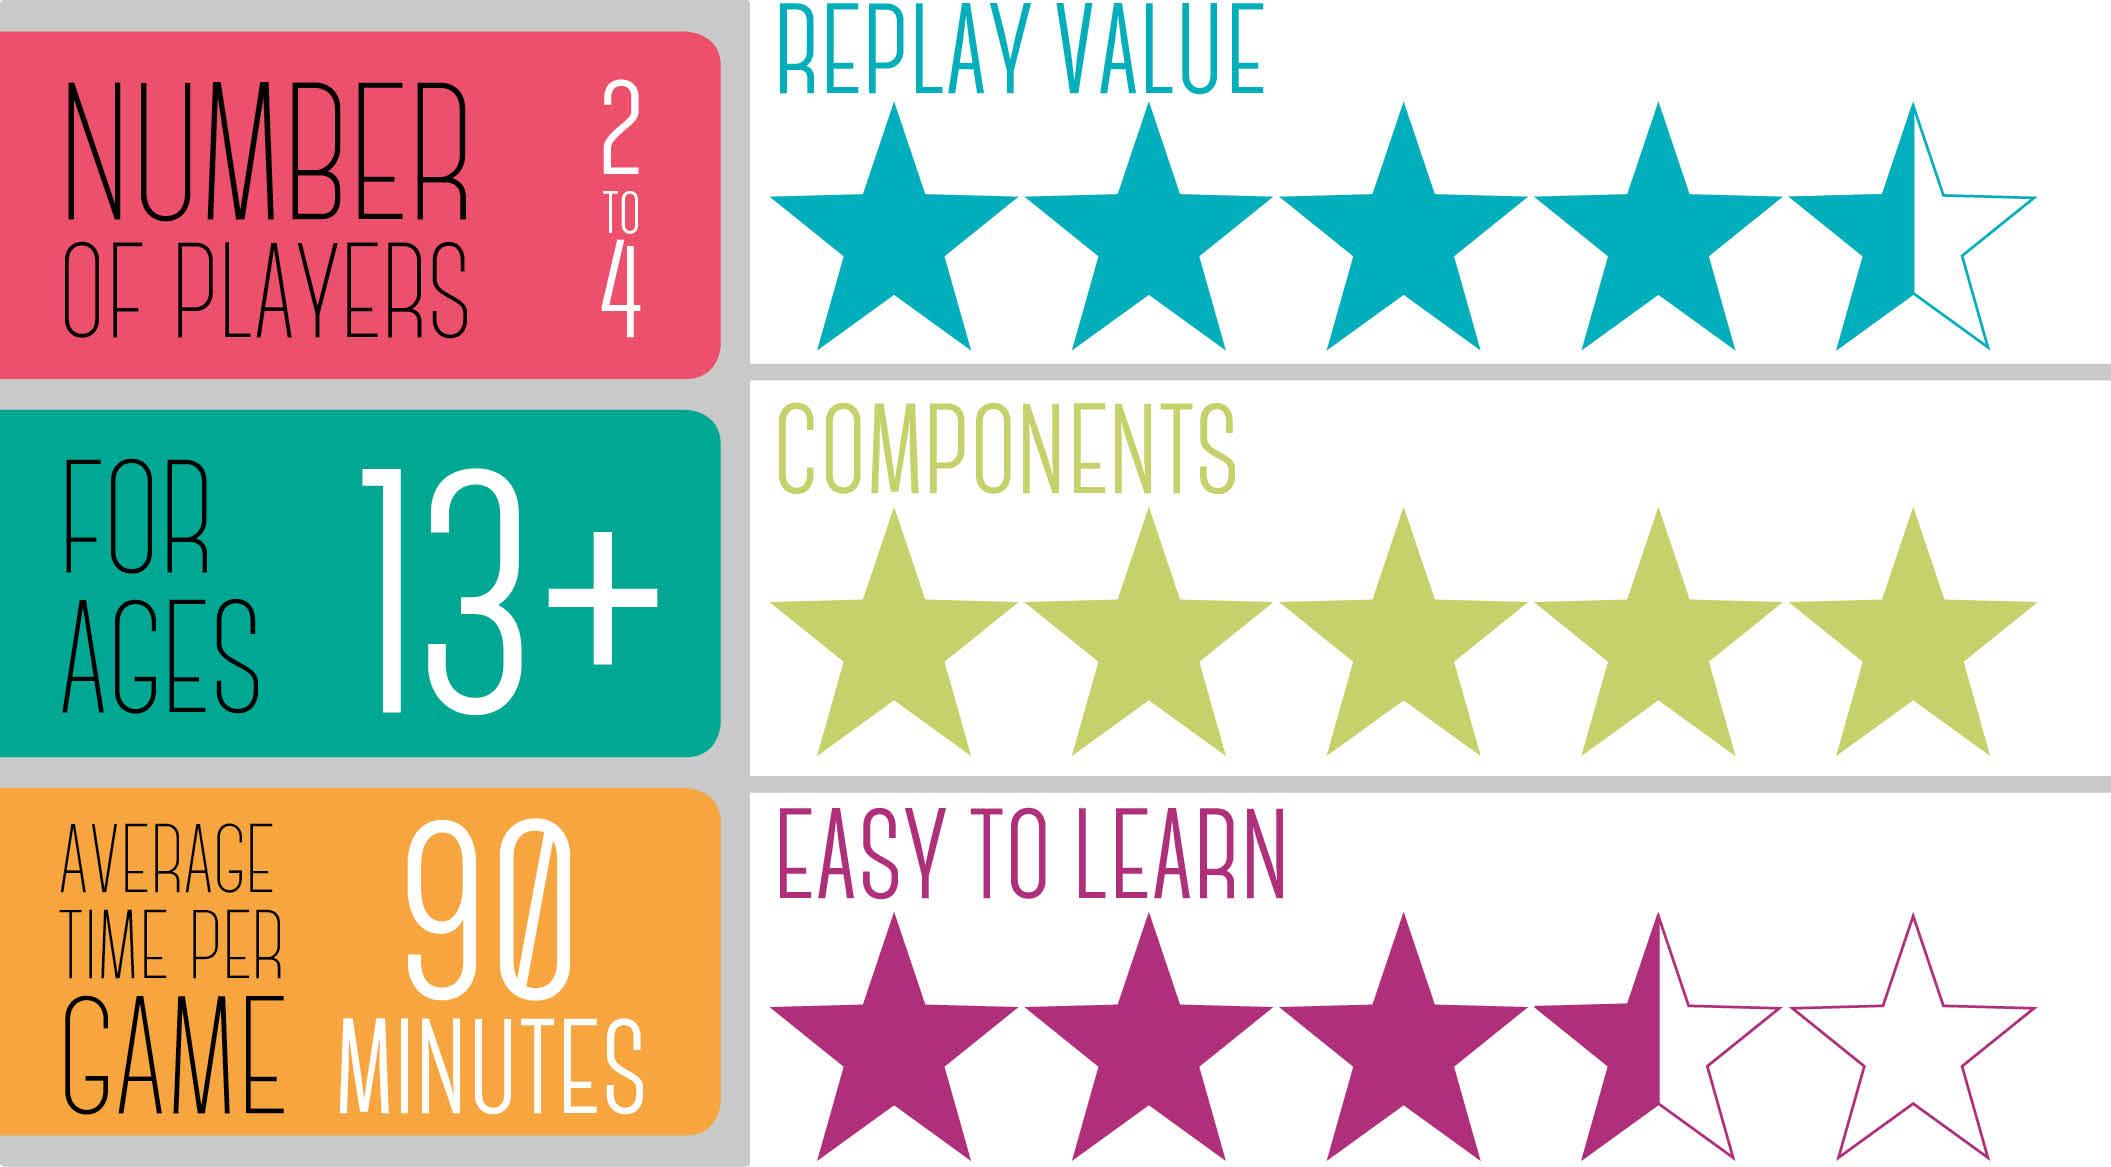 LazyLady-ratings-AboveAndBelow.jpg